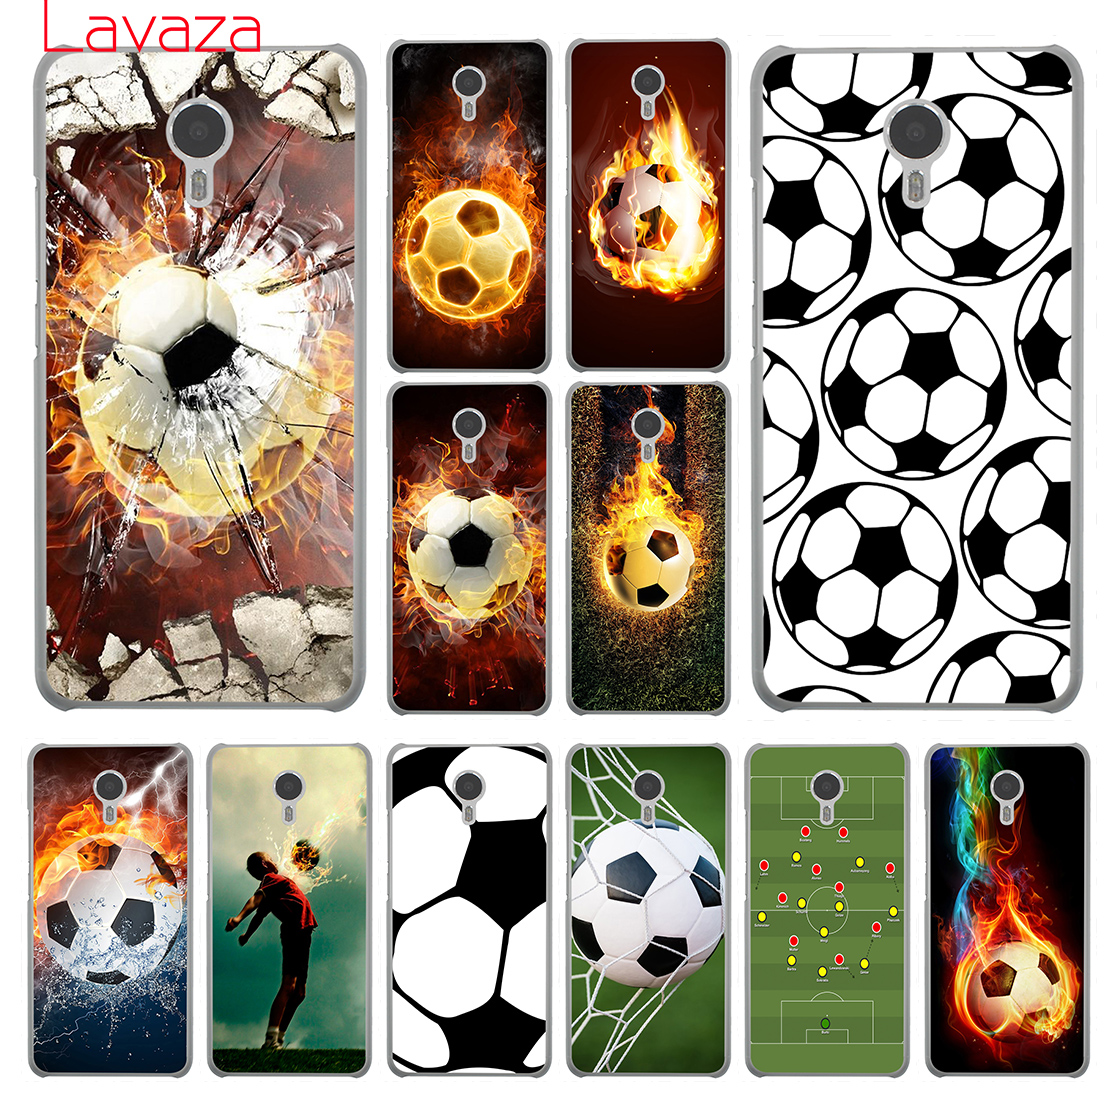 Lavaza Fire Football Soccer Ball Hard Phone Case for Meizu M6 M5 M5C M5S M3 M3S M2 Note Mini Pro 7 Plus 6 U10 U20 Cover